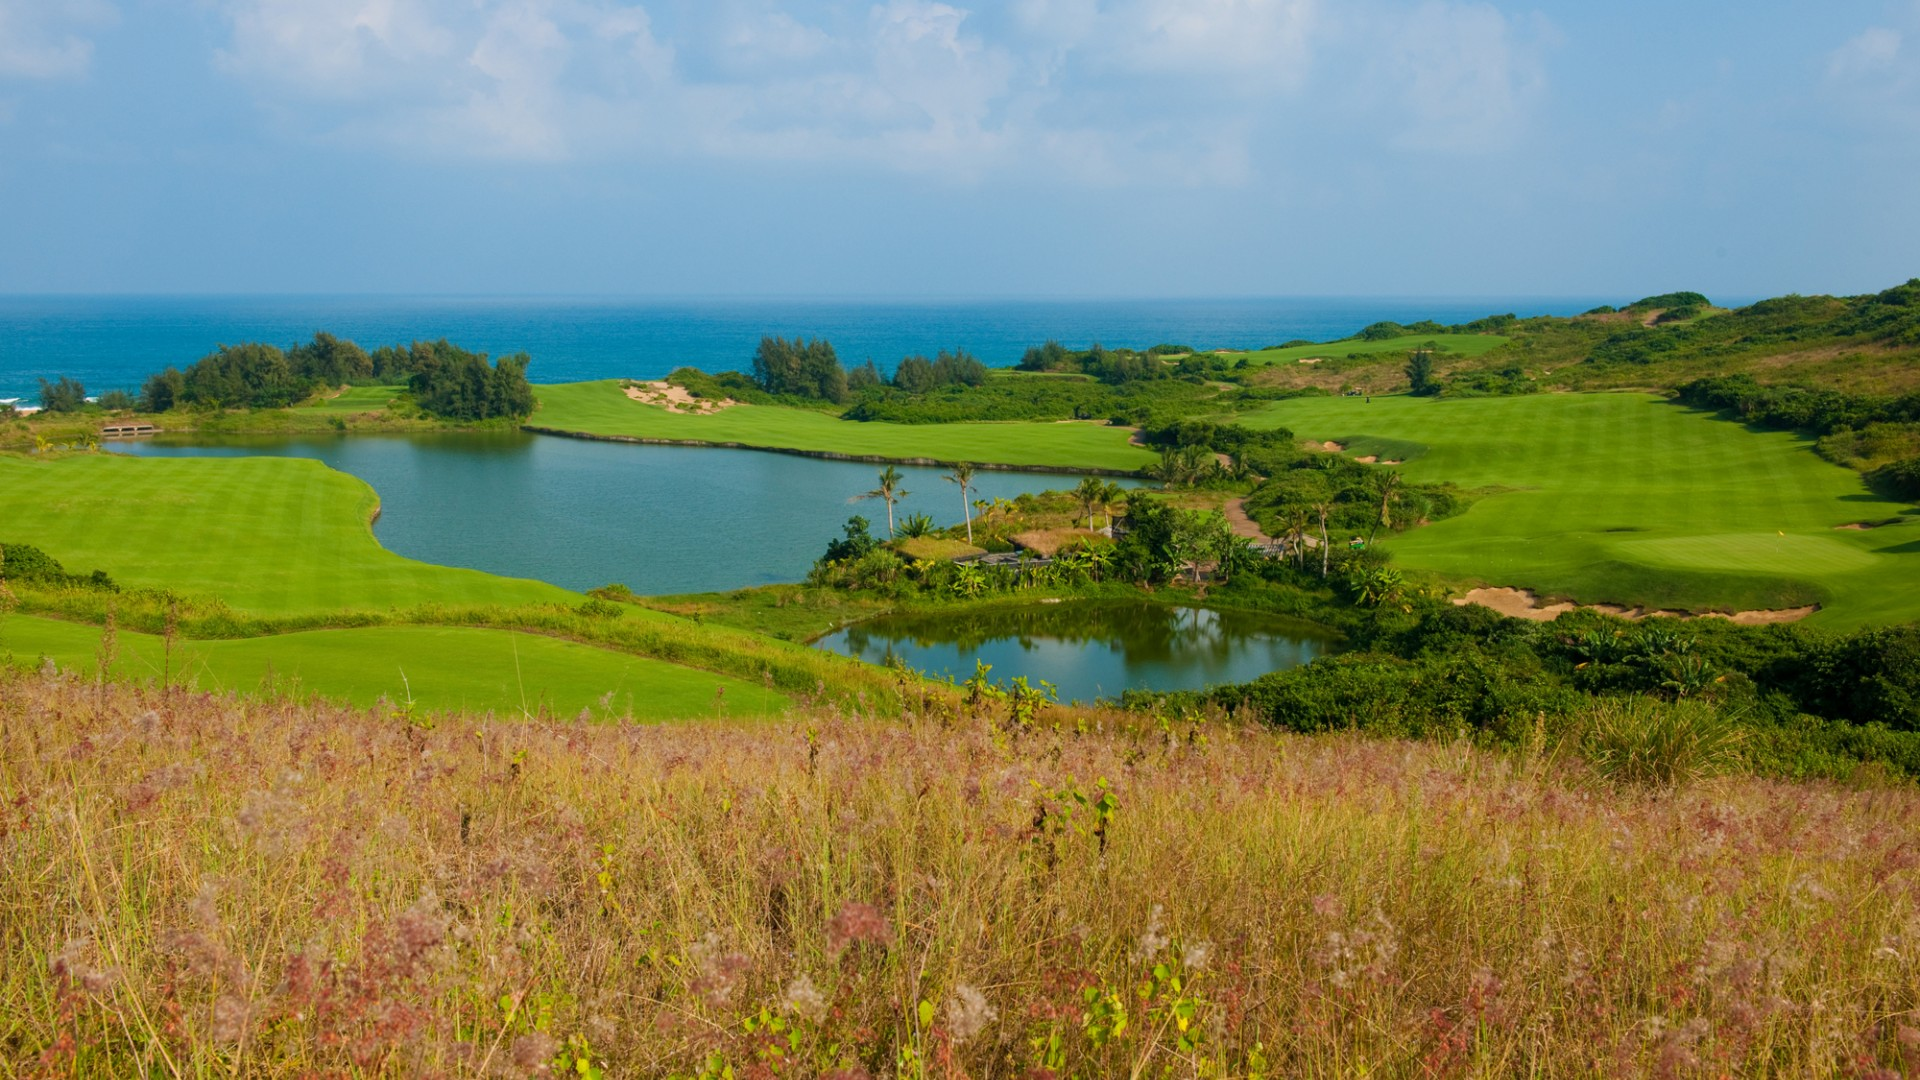 Shanqin Bay golf club, Hainan Island, China